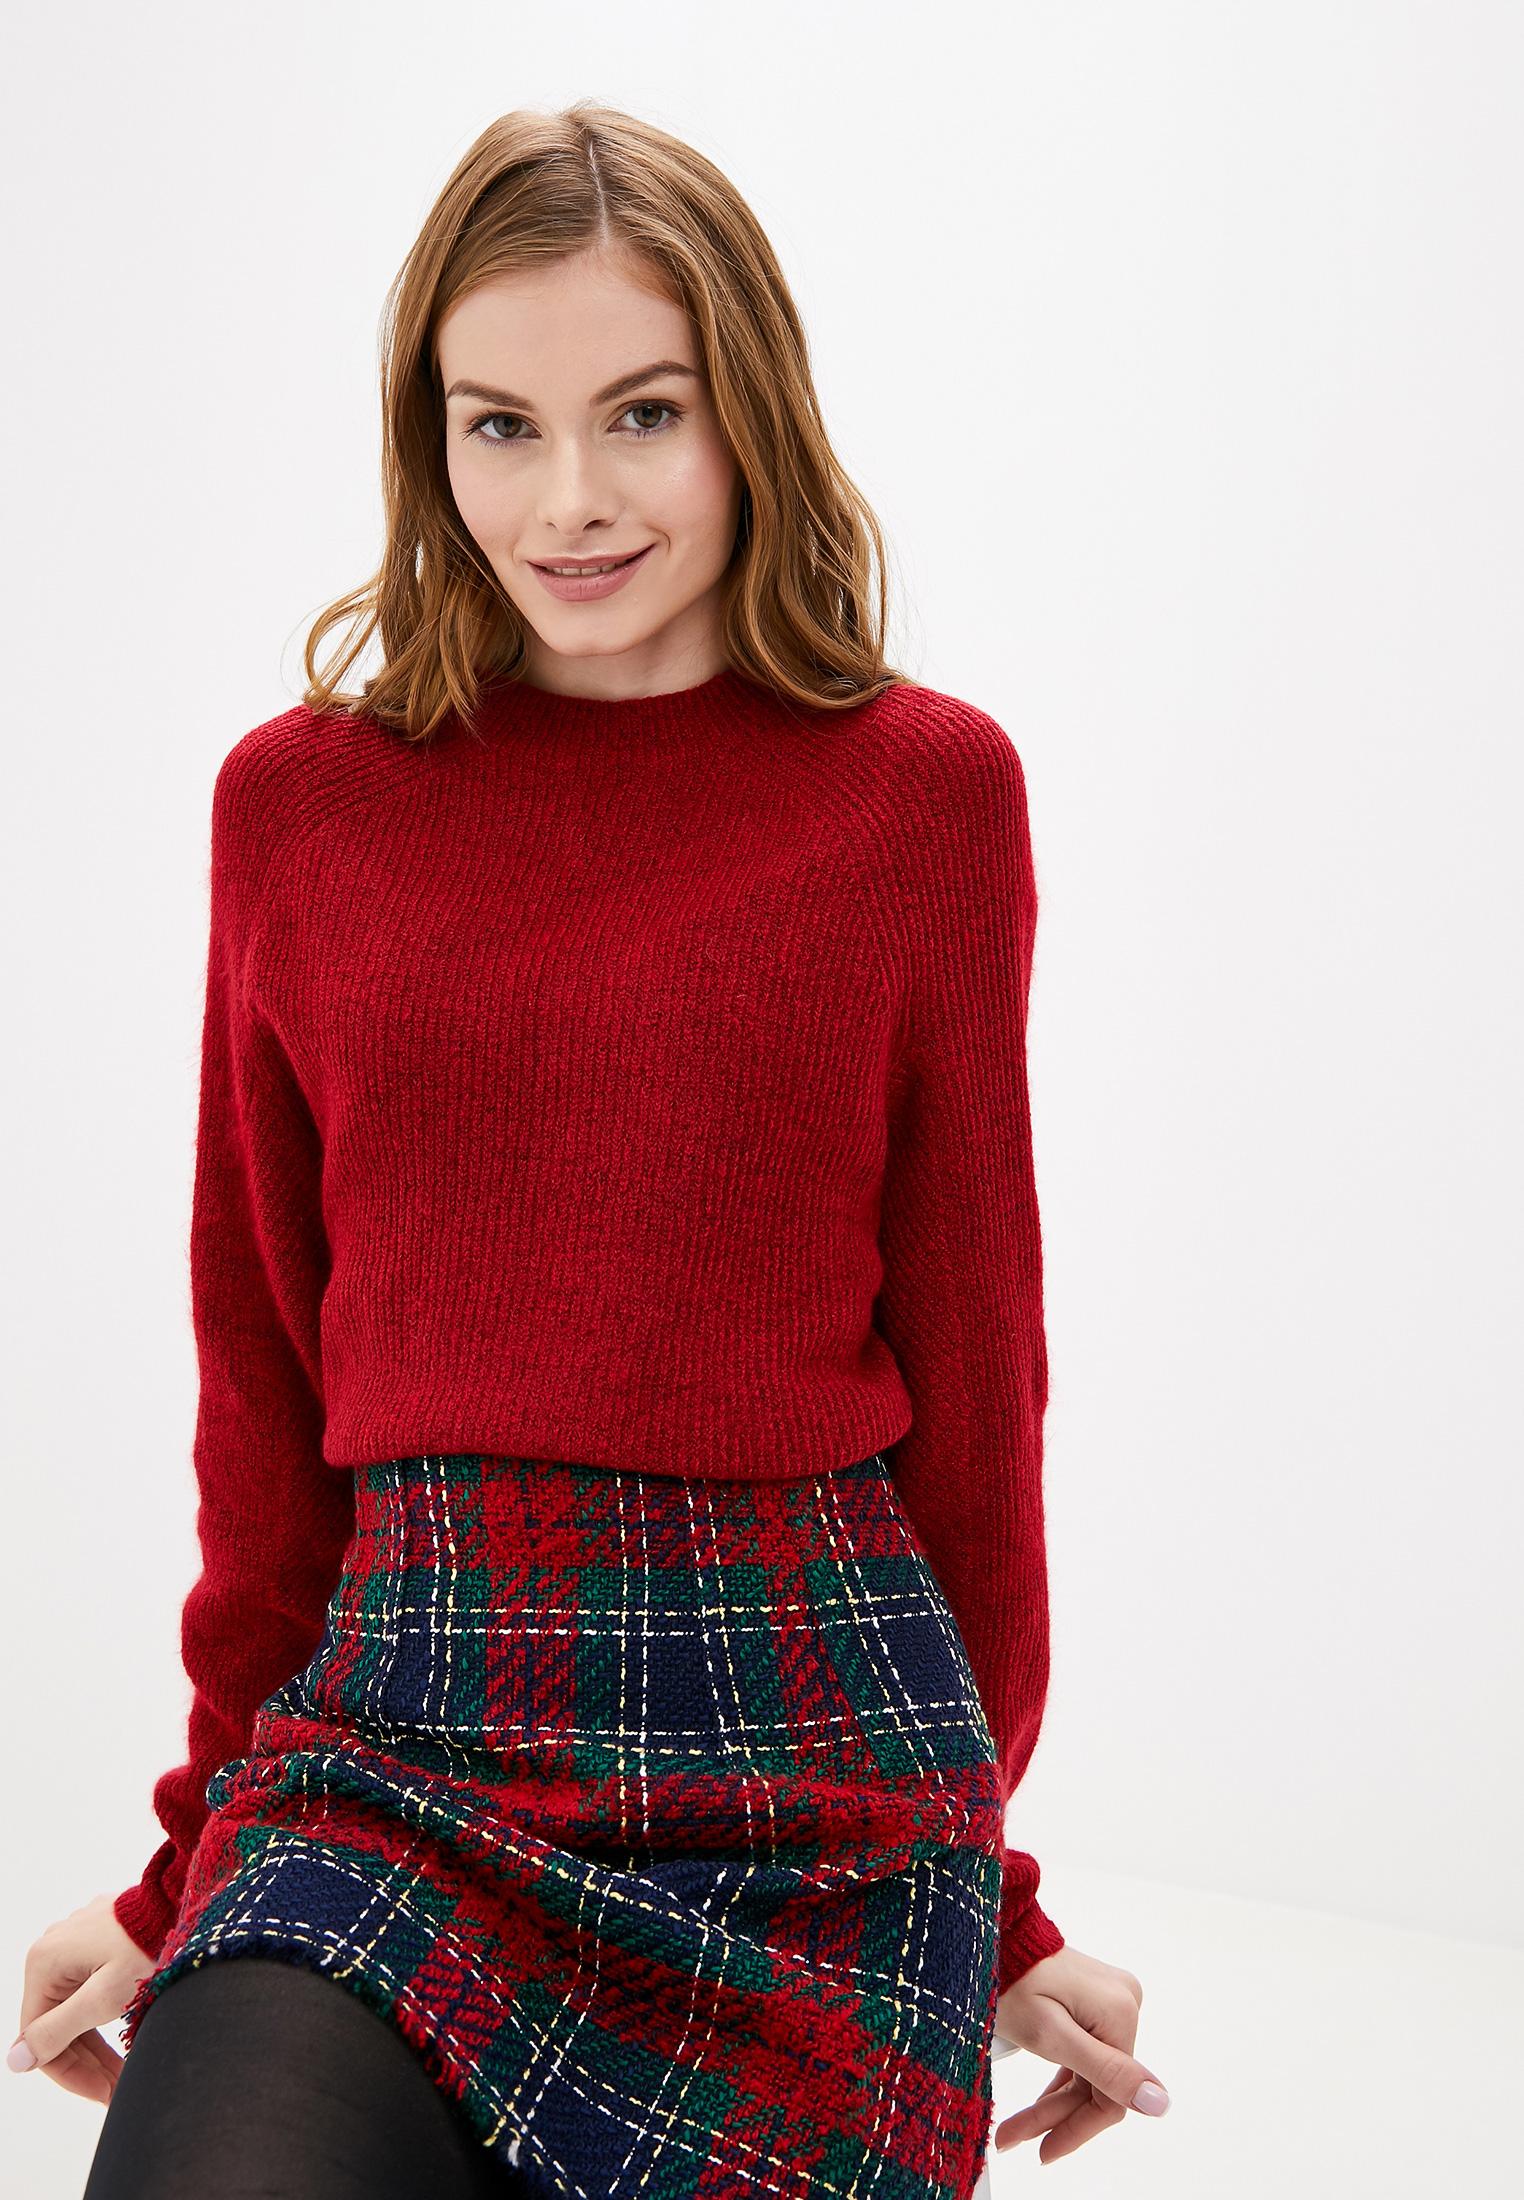 Джемпер, Gap, цвет: красный. Артикул: GA020EWGKTT6. Одежда / Джемперы, свитеры и кардиганы